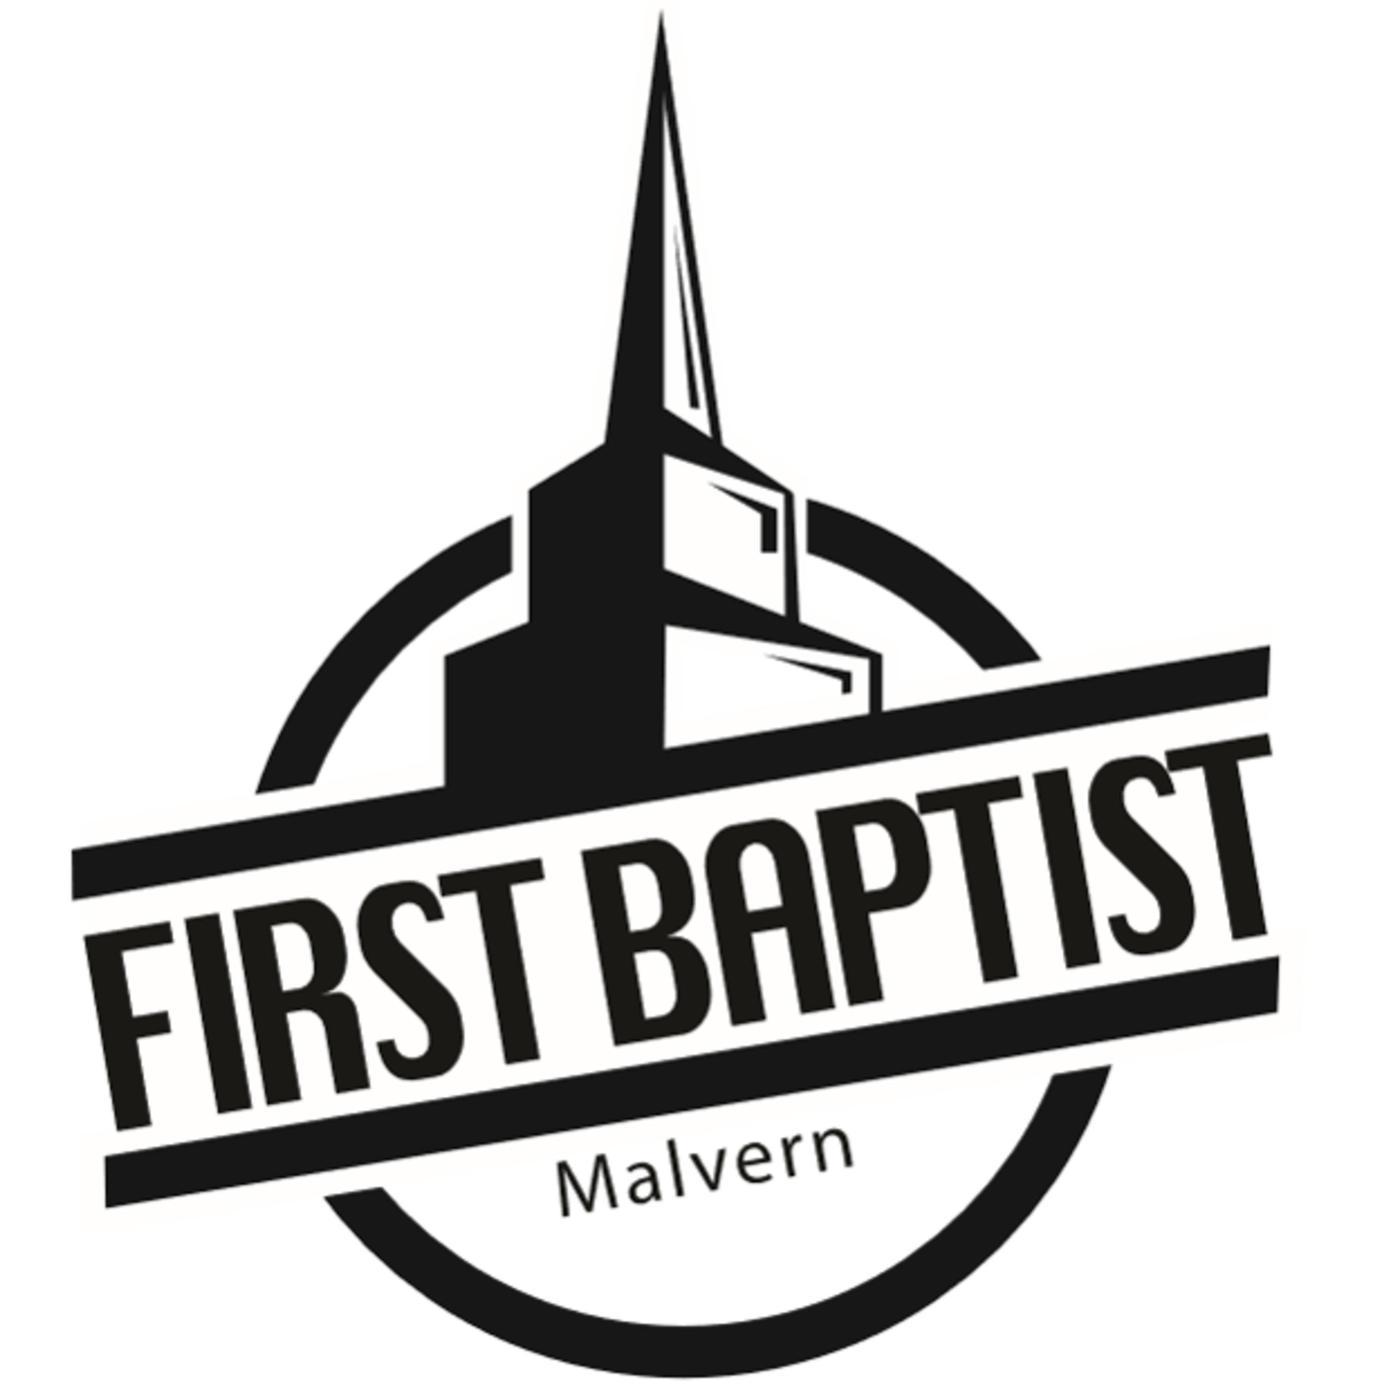 First Baptist Church - Malvern (podcast) - First Baptist Church